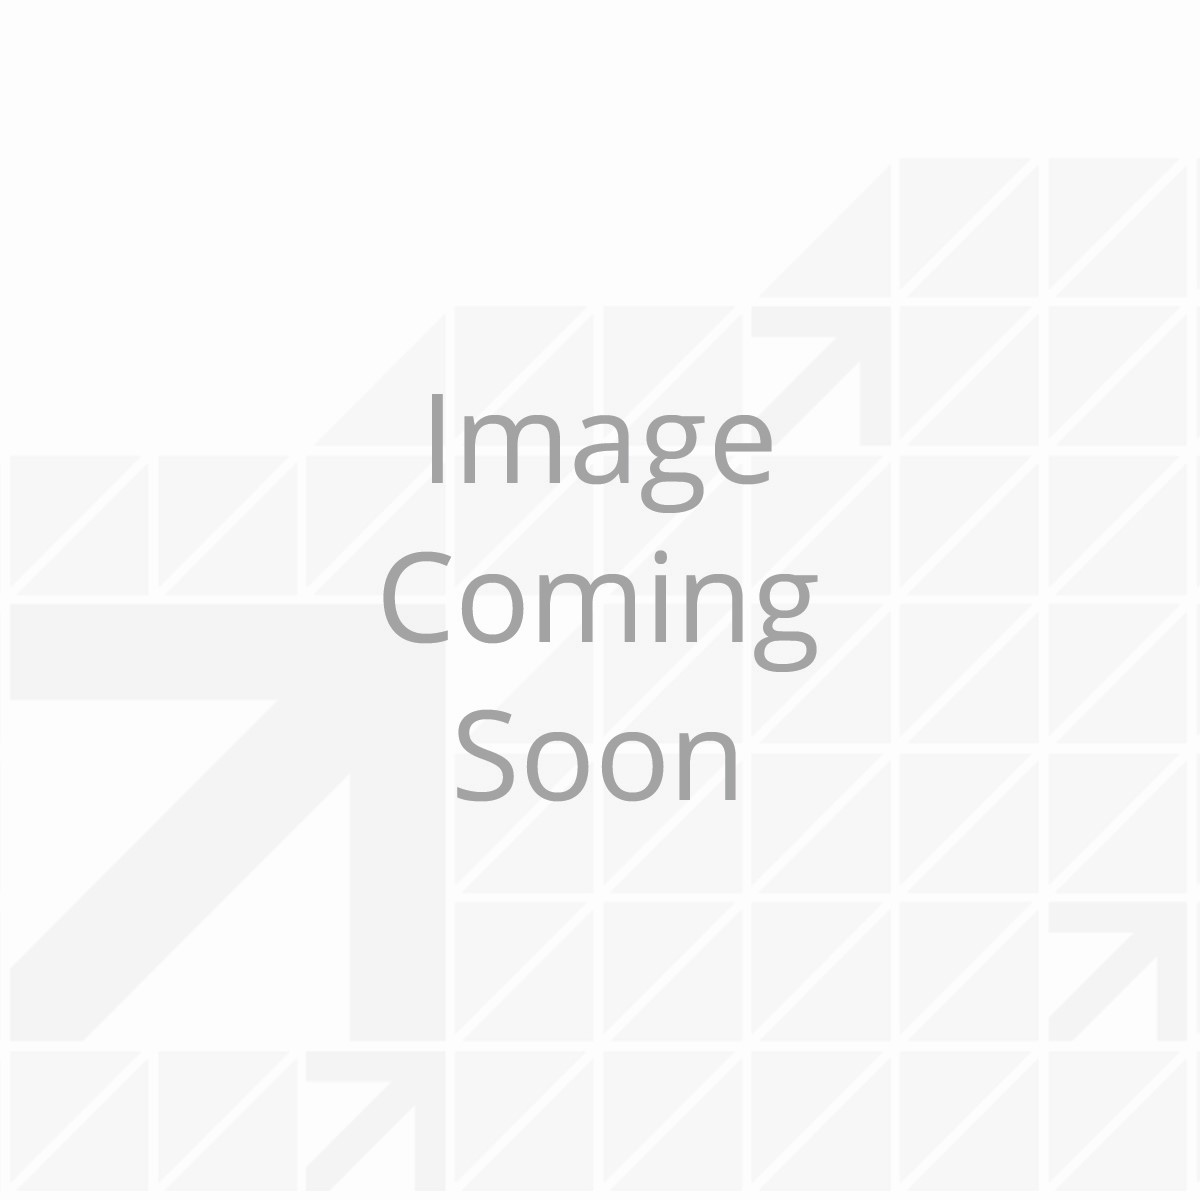 FT-DR8 2008-2009 Dodge Tiedown Kit